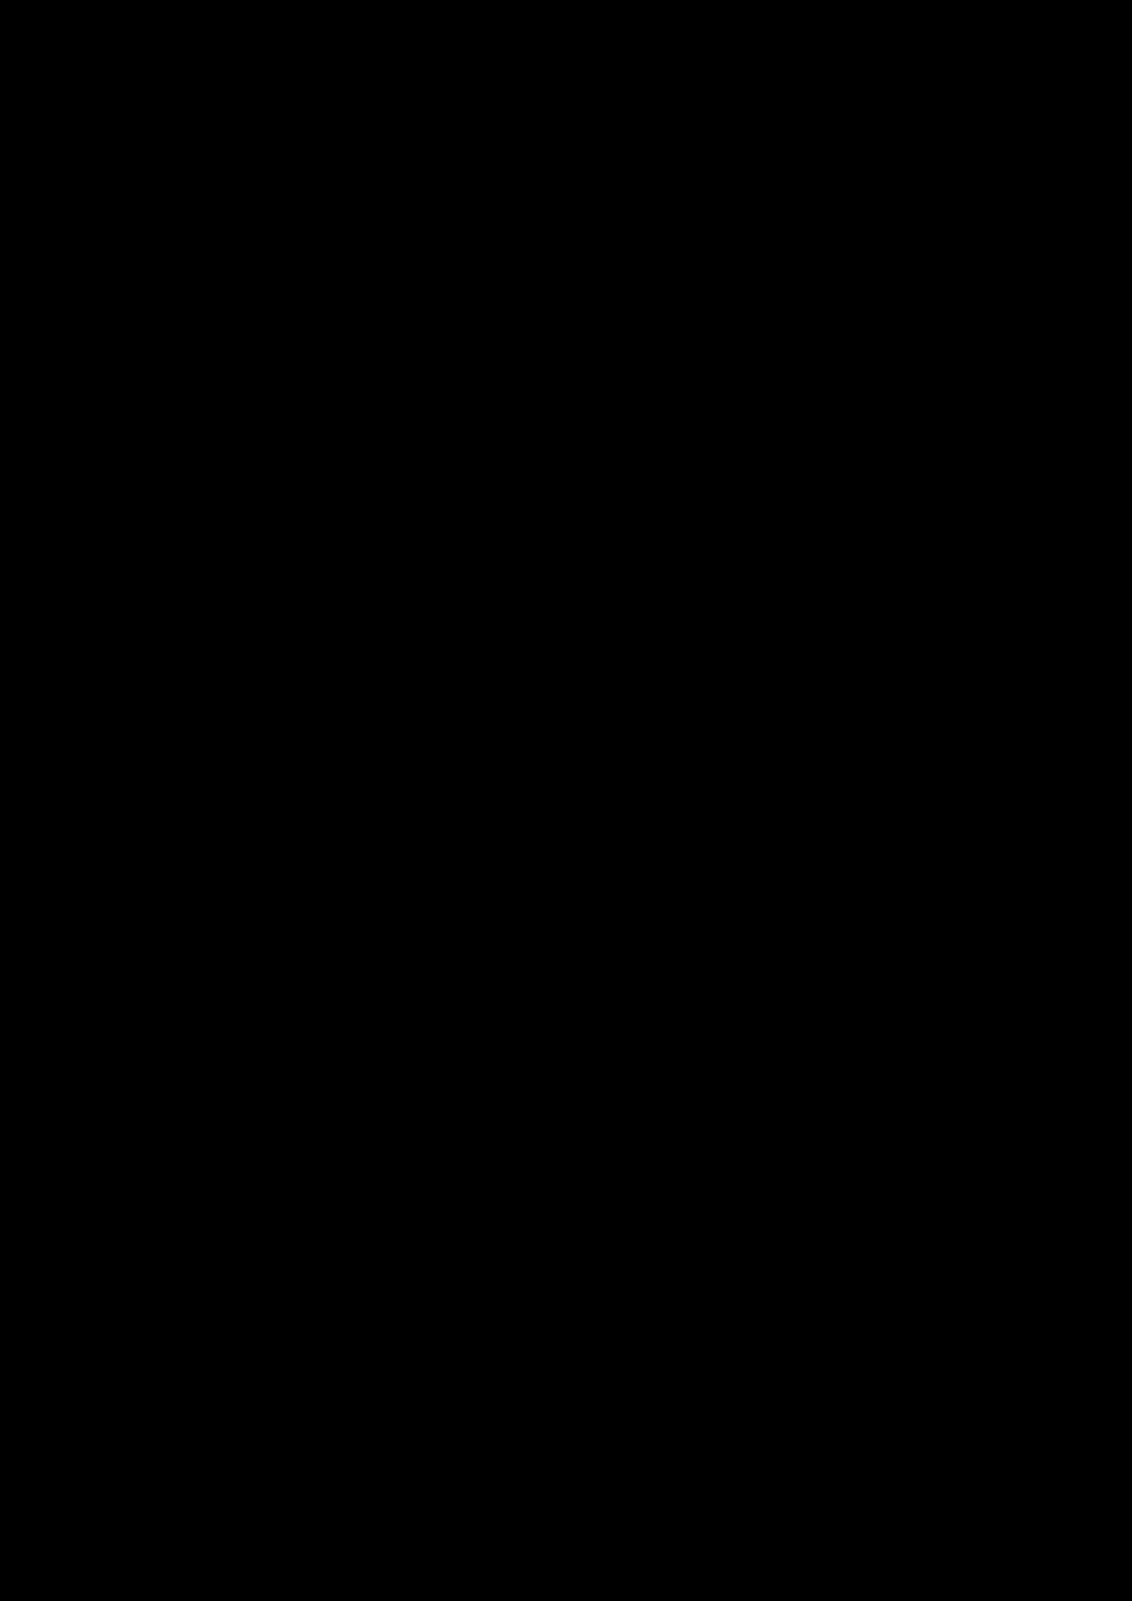 Korolevstvo slez slide, Image 75